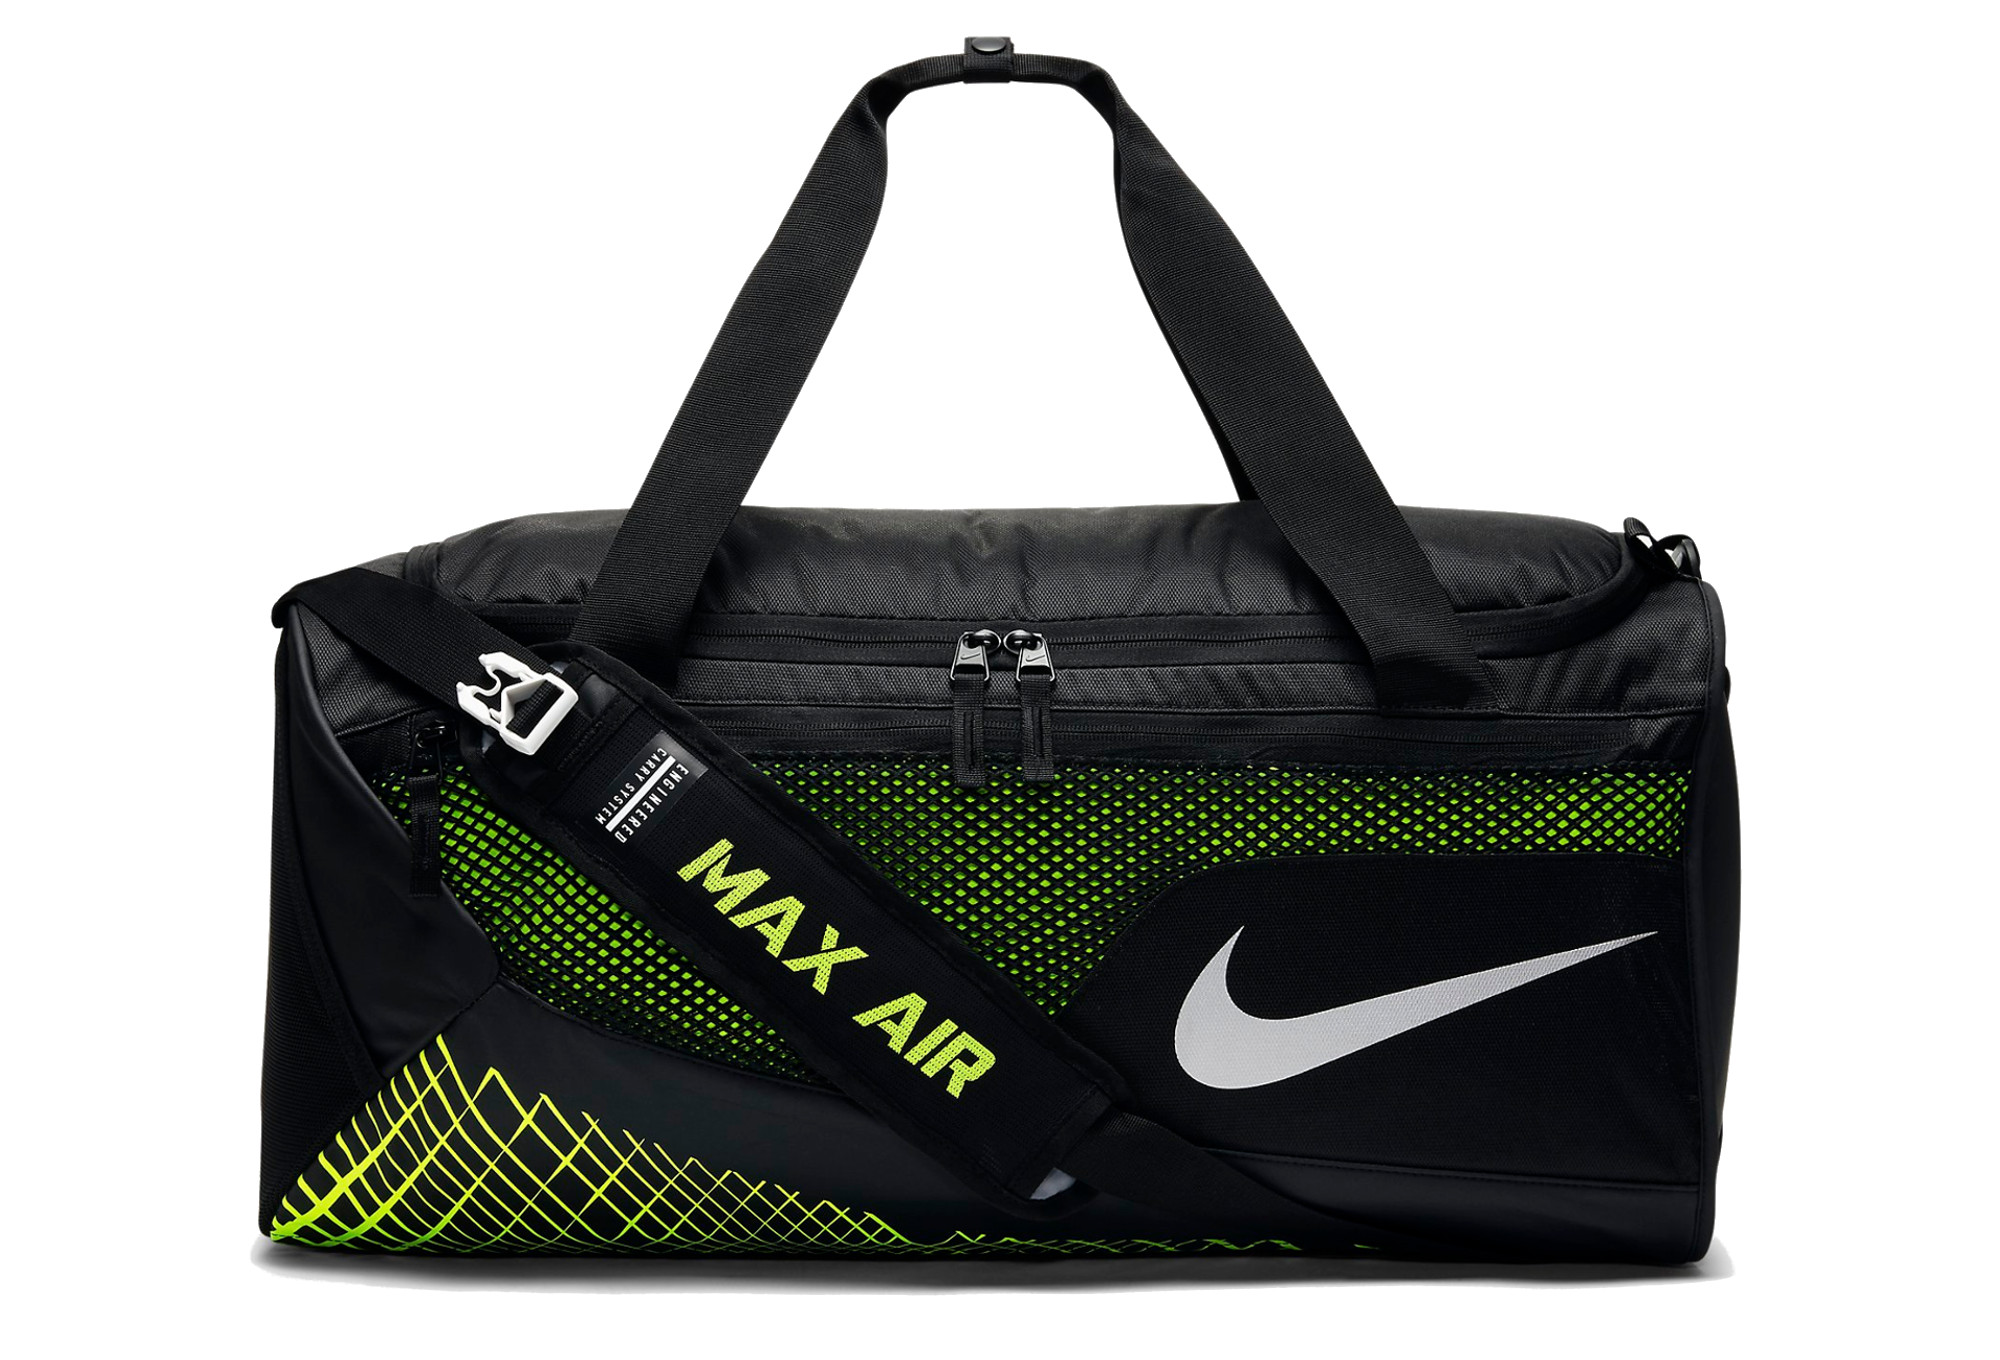 Jaune Sac Noir 57l Nike De Sport Vapor Max Air wUWUAfqFS